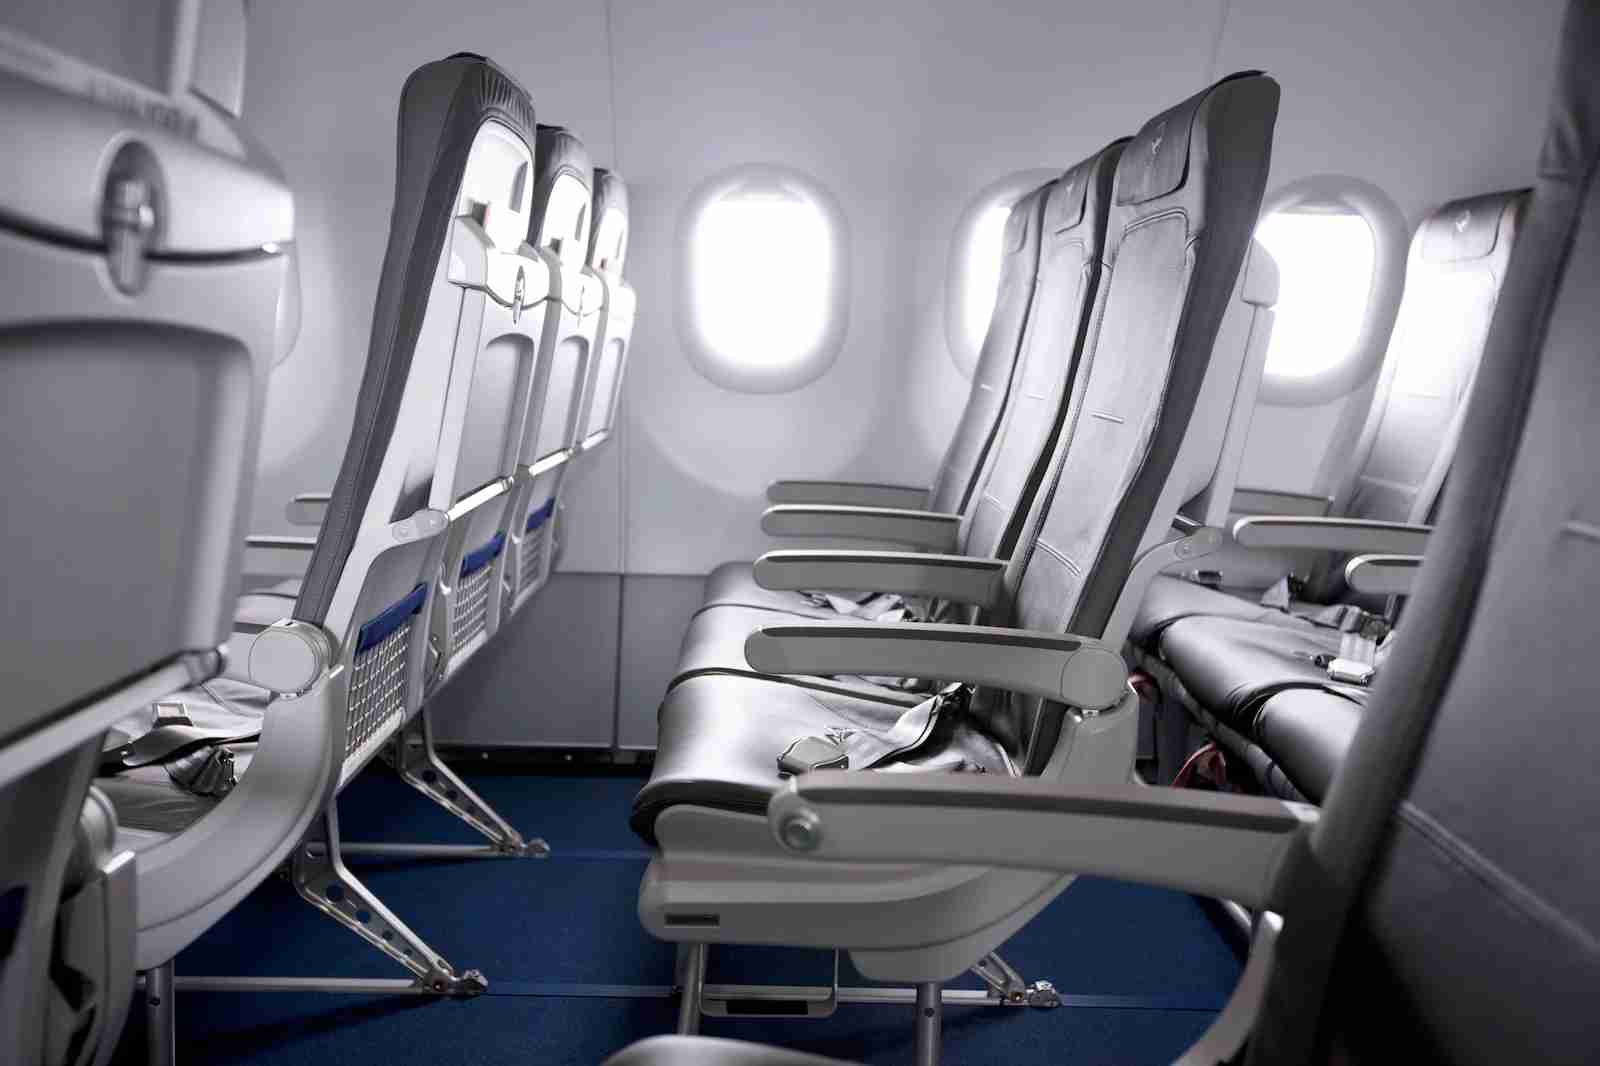 Lufthansa intra-Europe economy seating